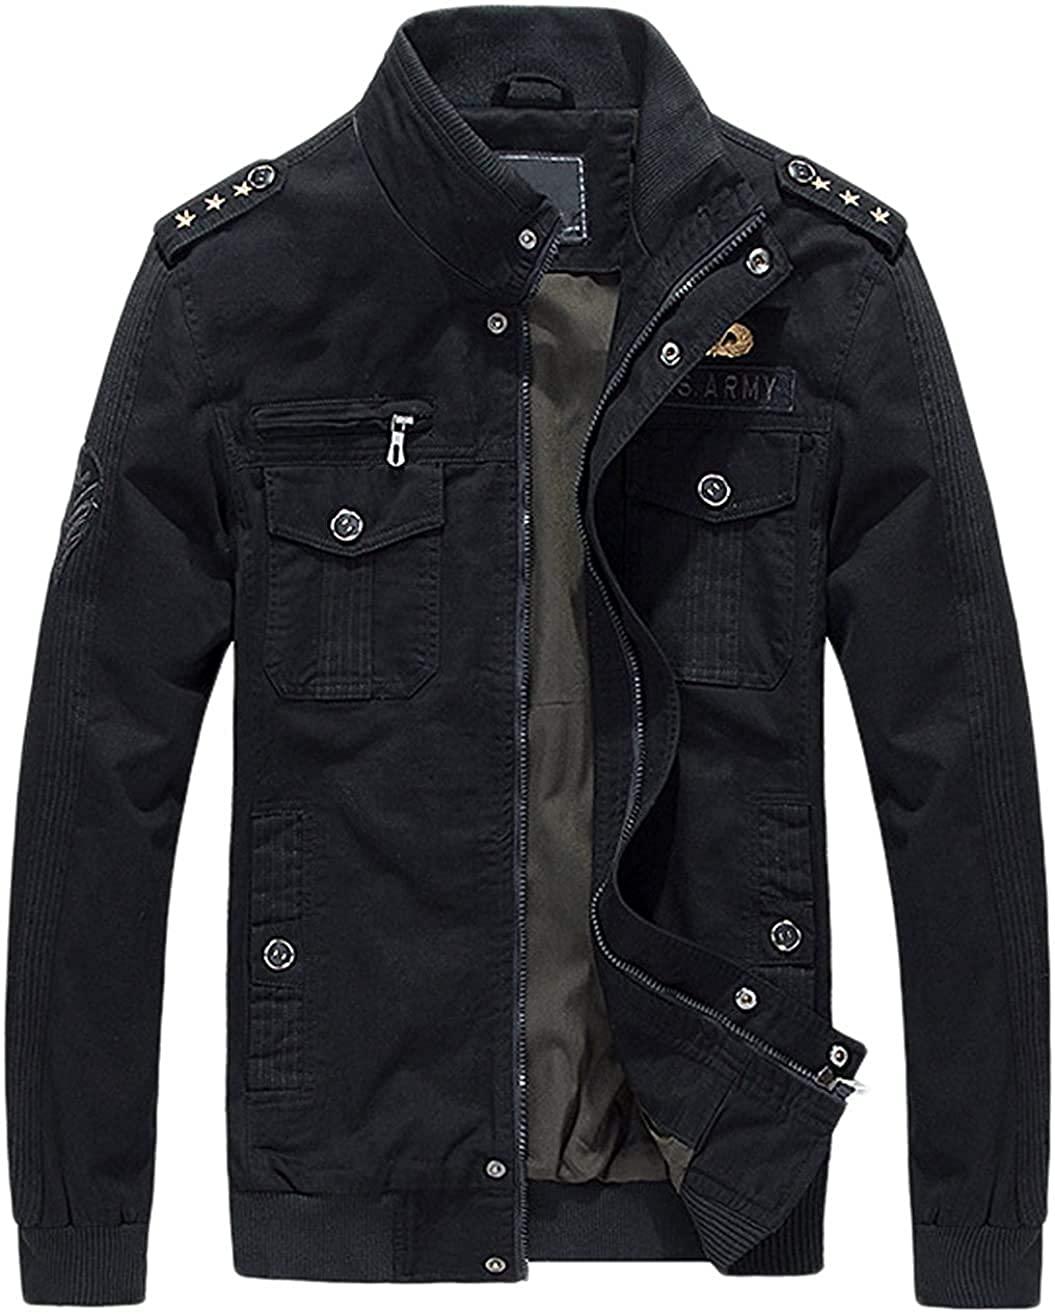 Men's Military Stylish Zip-Front Lightweight Cotton Bomber Jacket,Black,X-Small